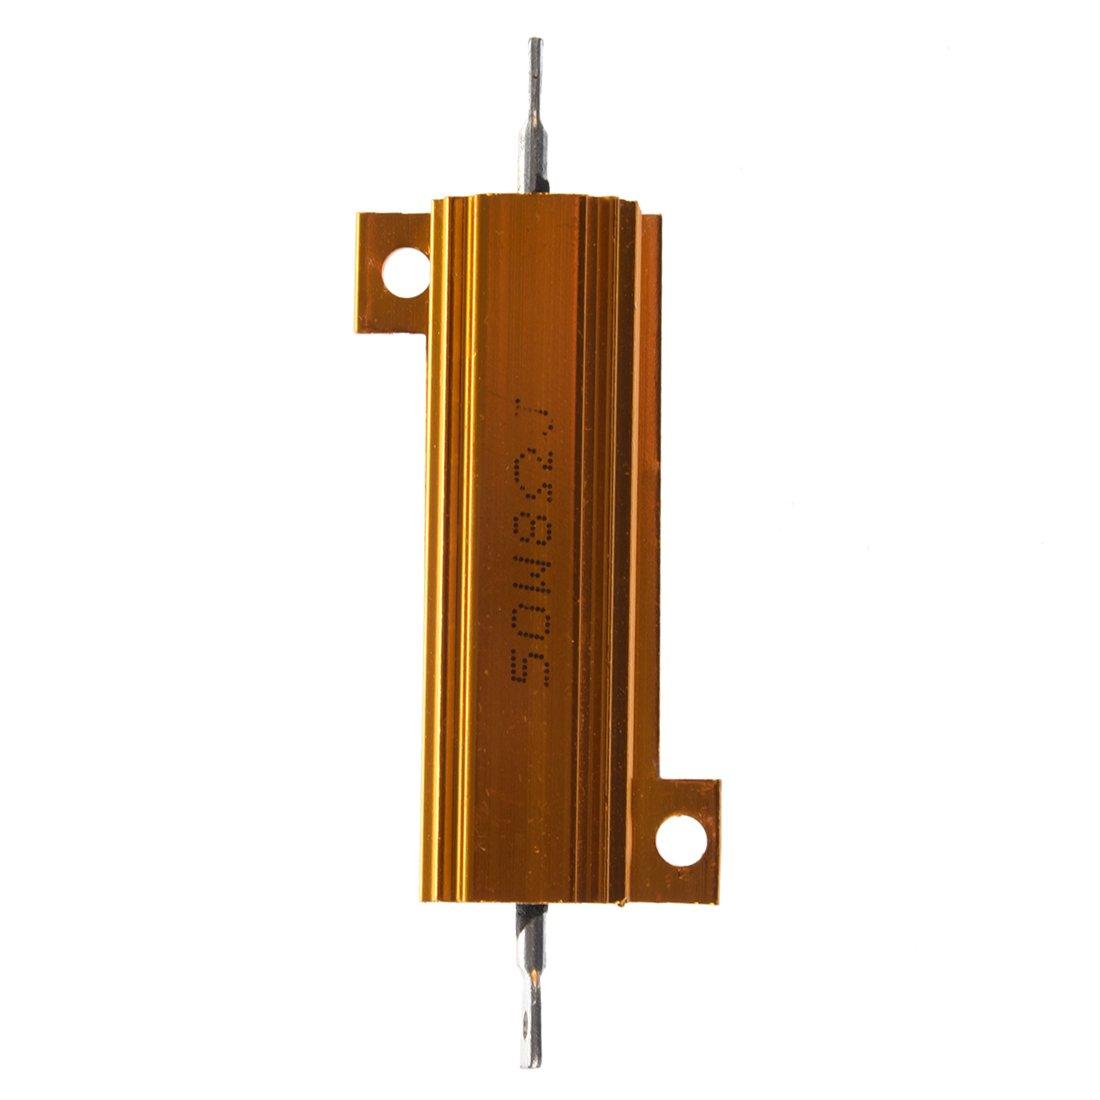 WOVELOT 50 W 8 Ohms 5/% Resistance de puissance bobinee vetue daluminium Ton or